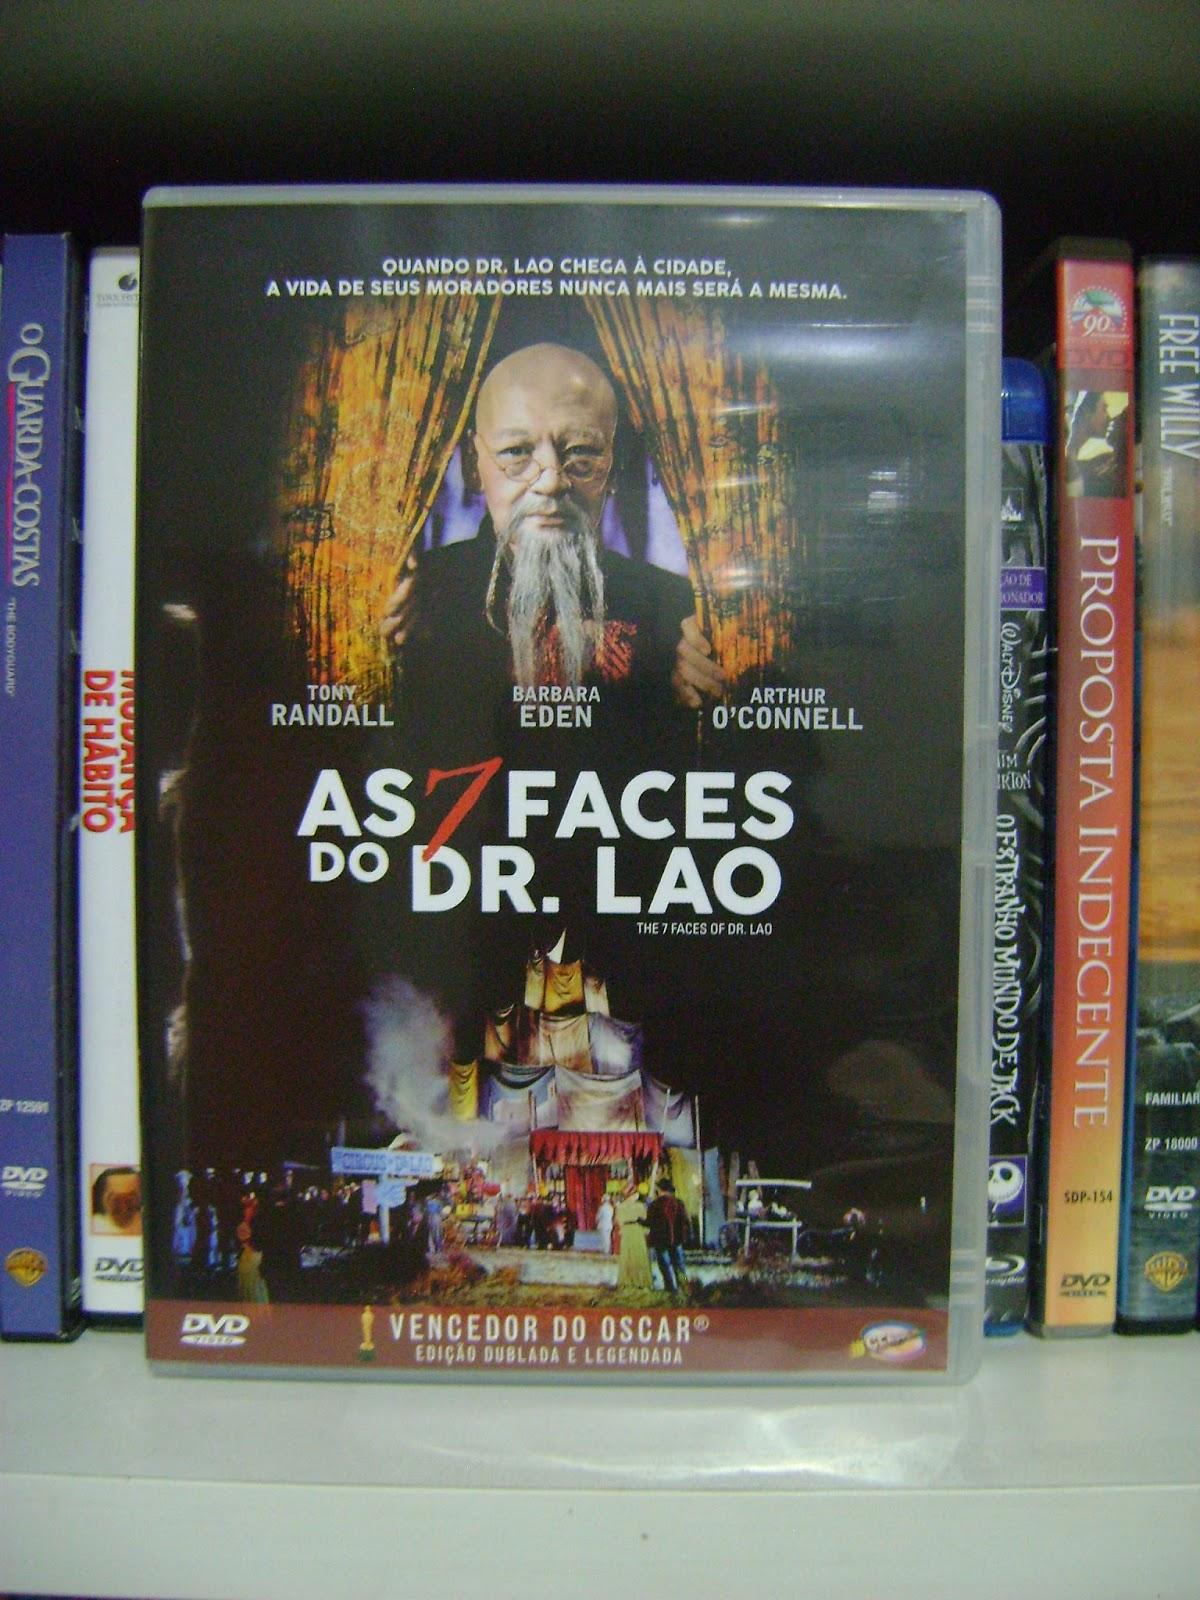 7 Faces Of Dr Lao Dvd Lenovo Ibm Employee Purchase Program